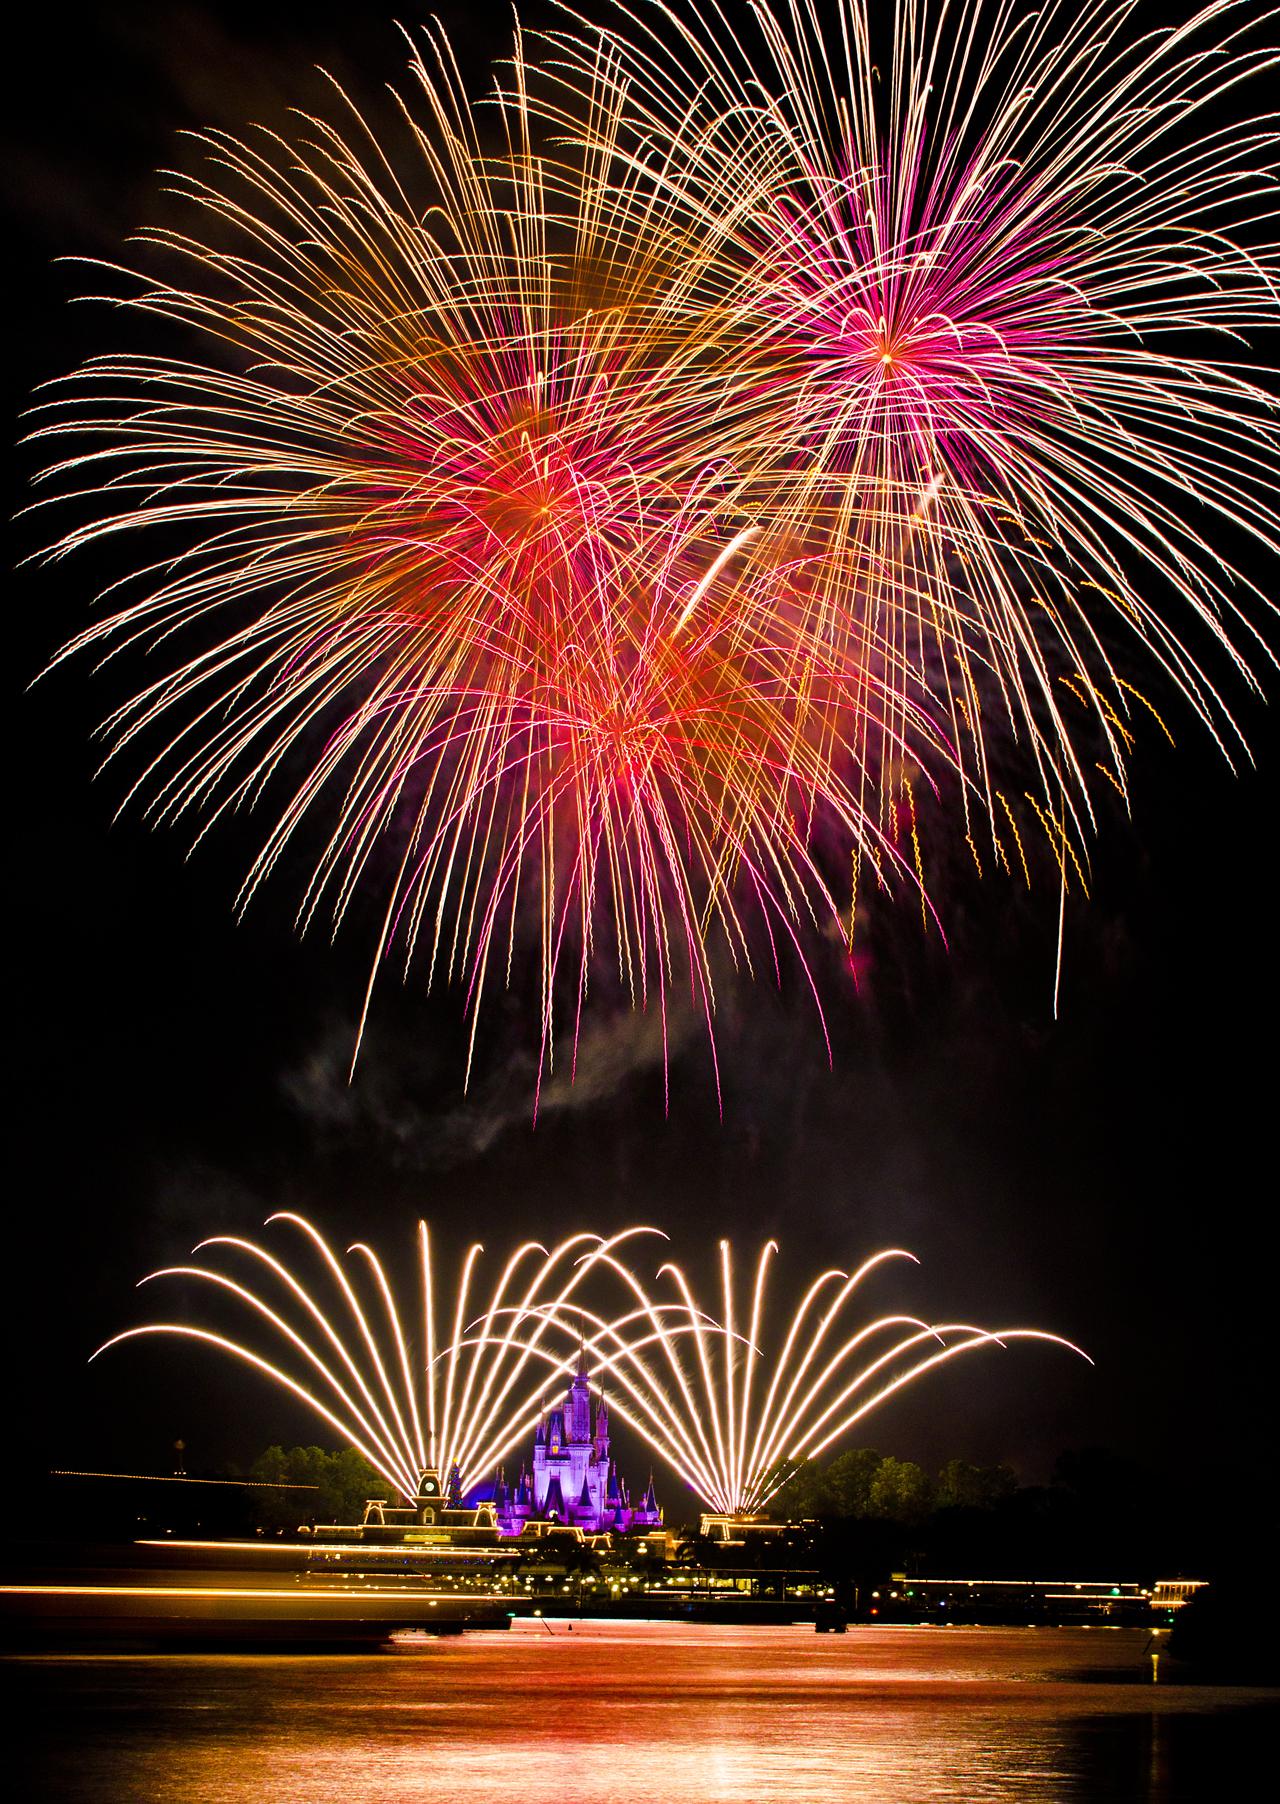 40 Awesometacular Fireworks Photos